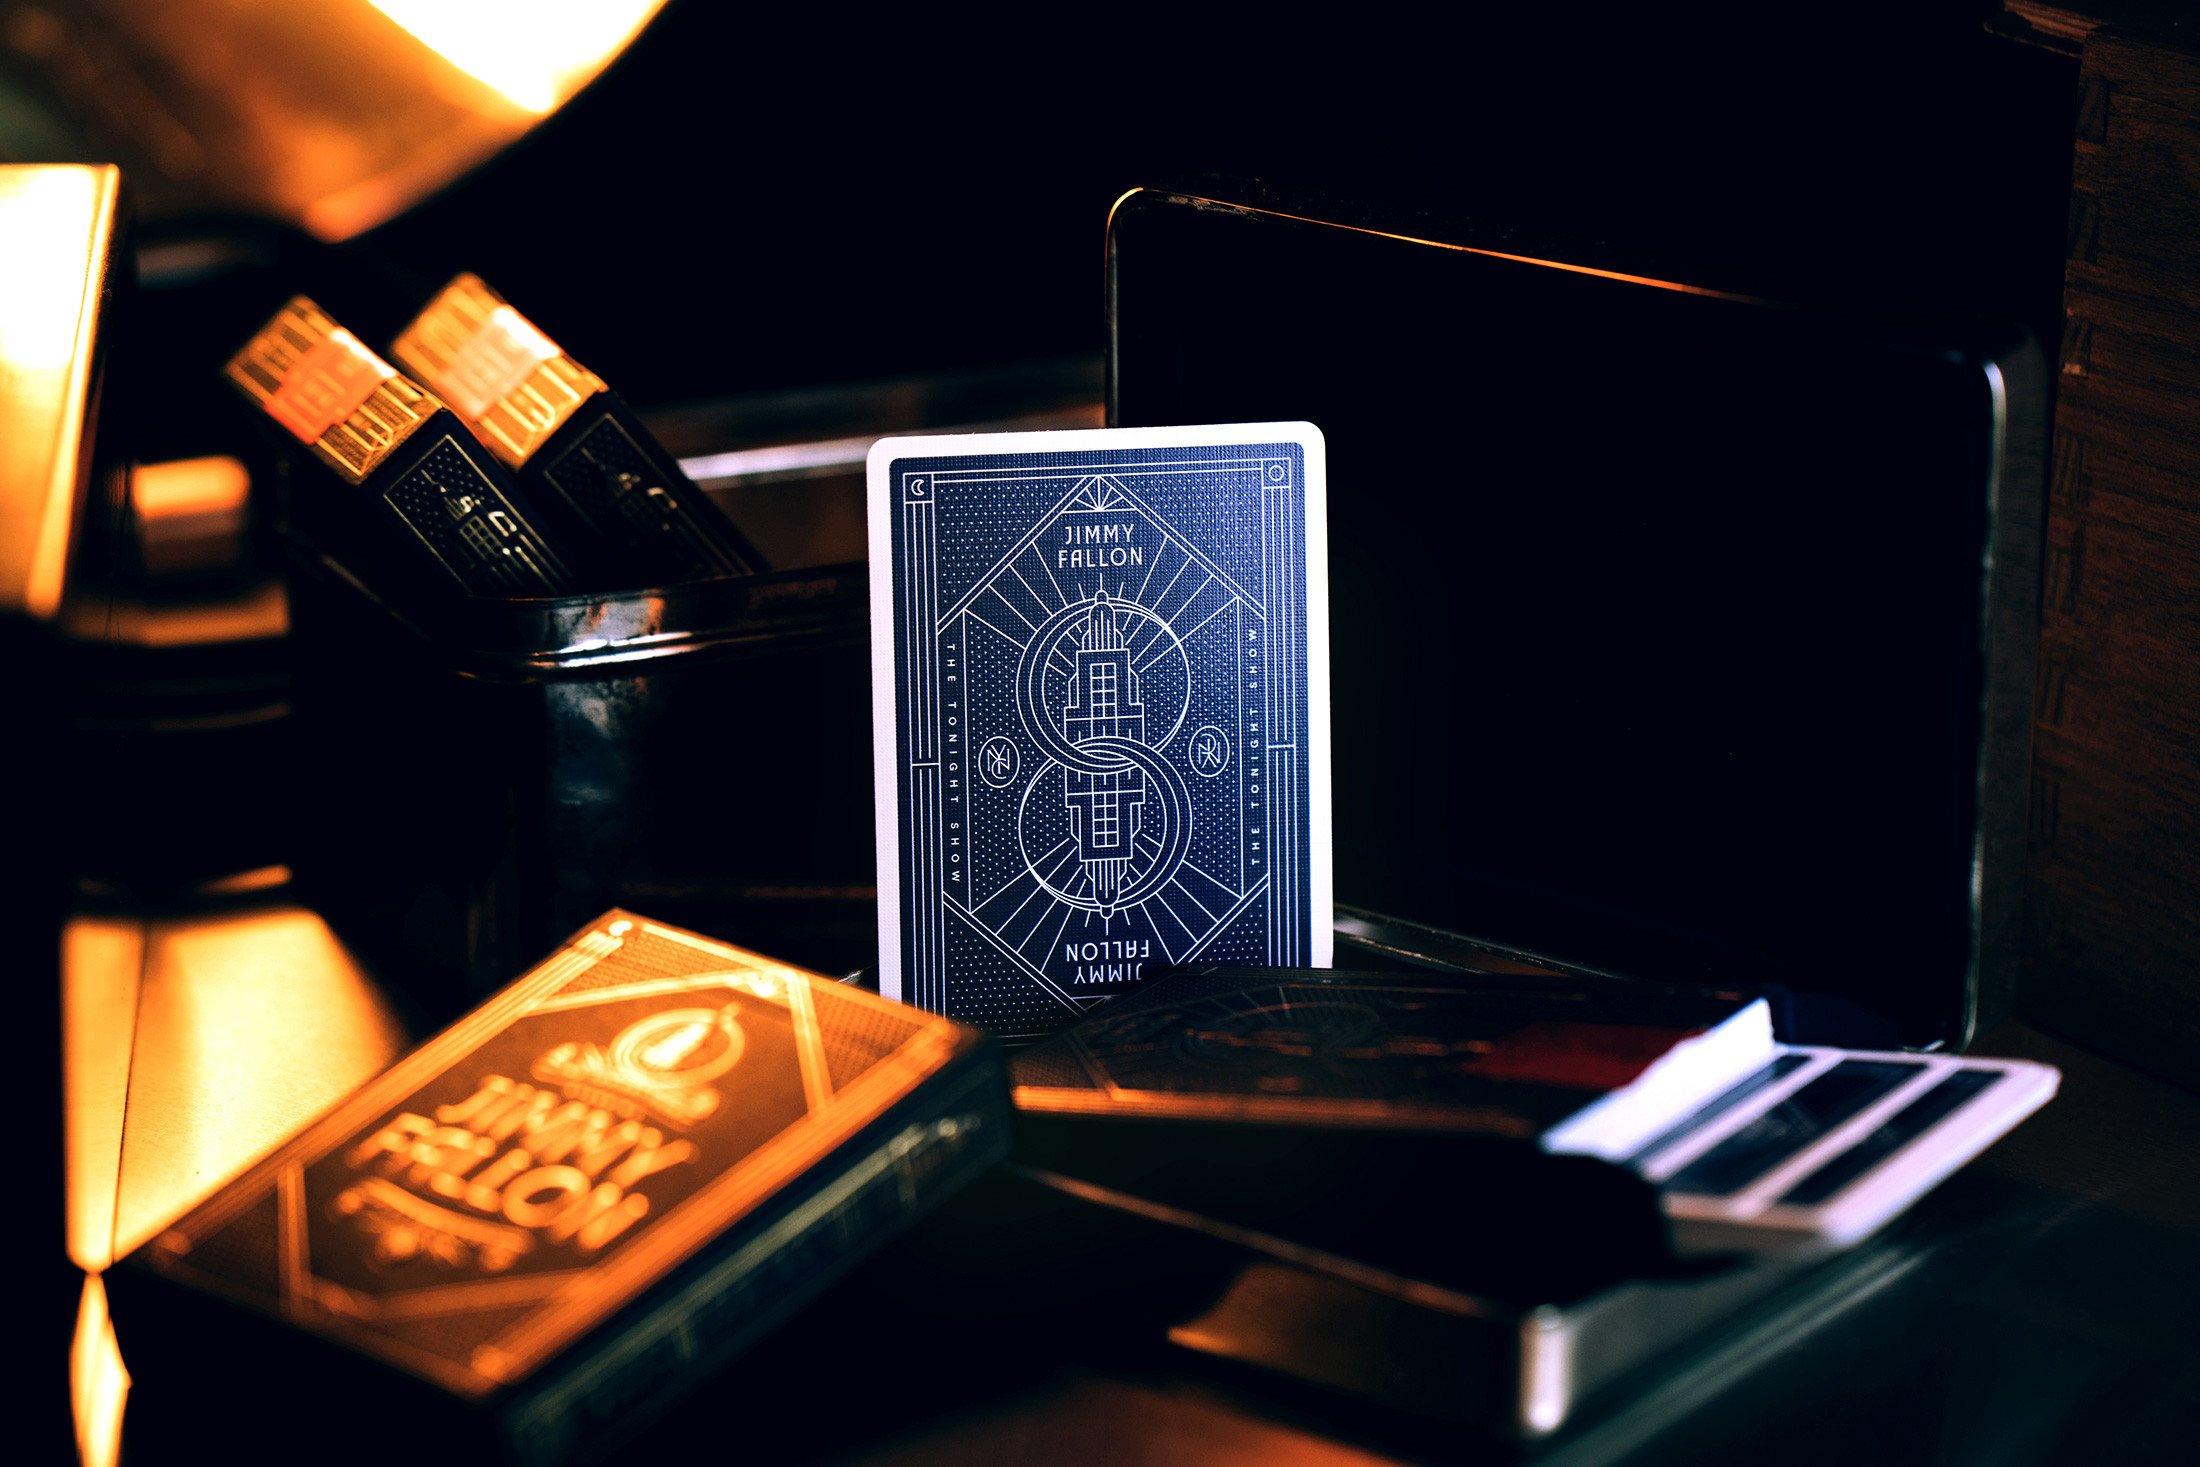 jimmy-fallon-playing-cards-03.jpg